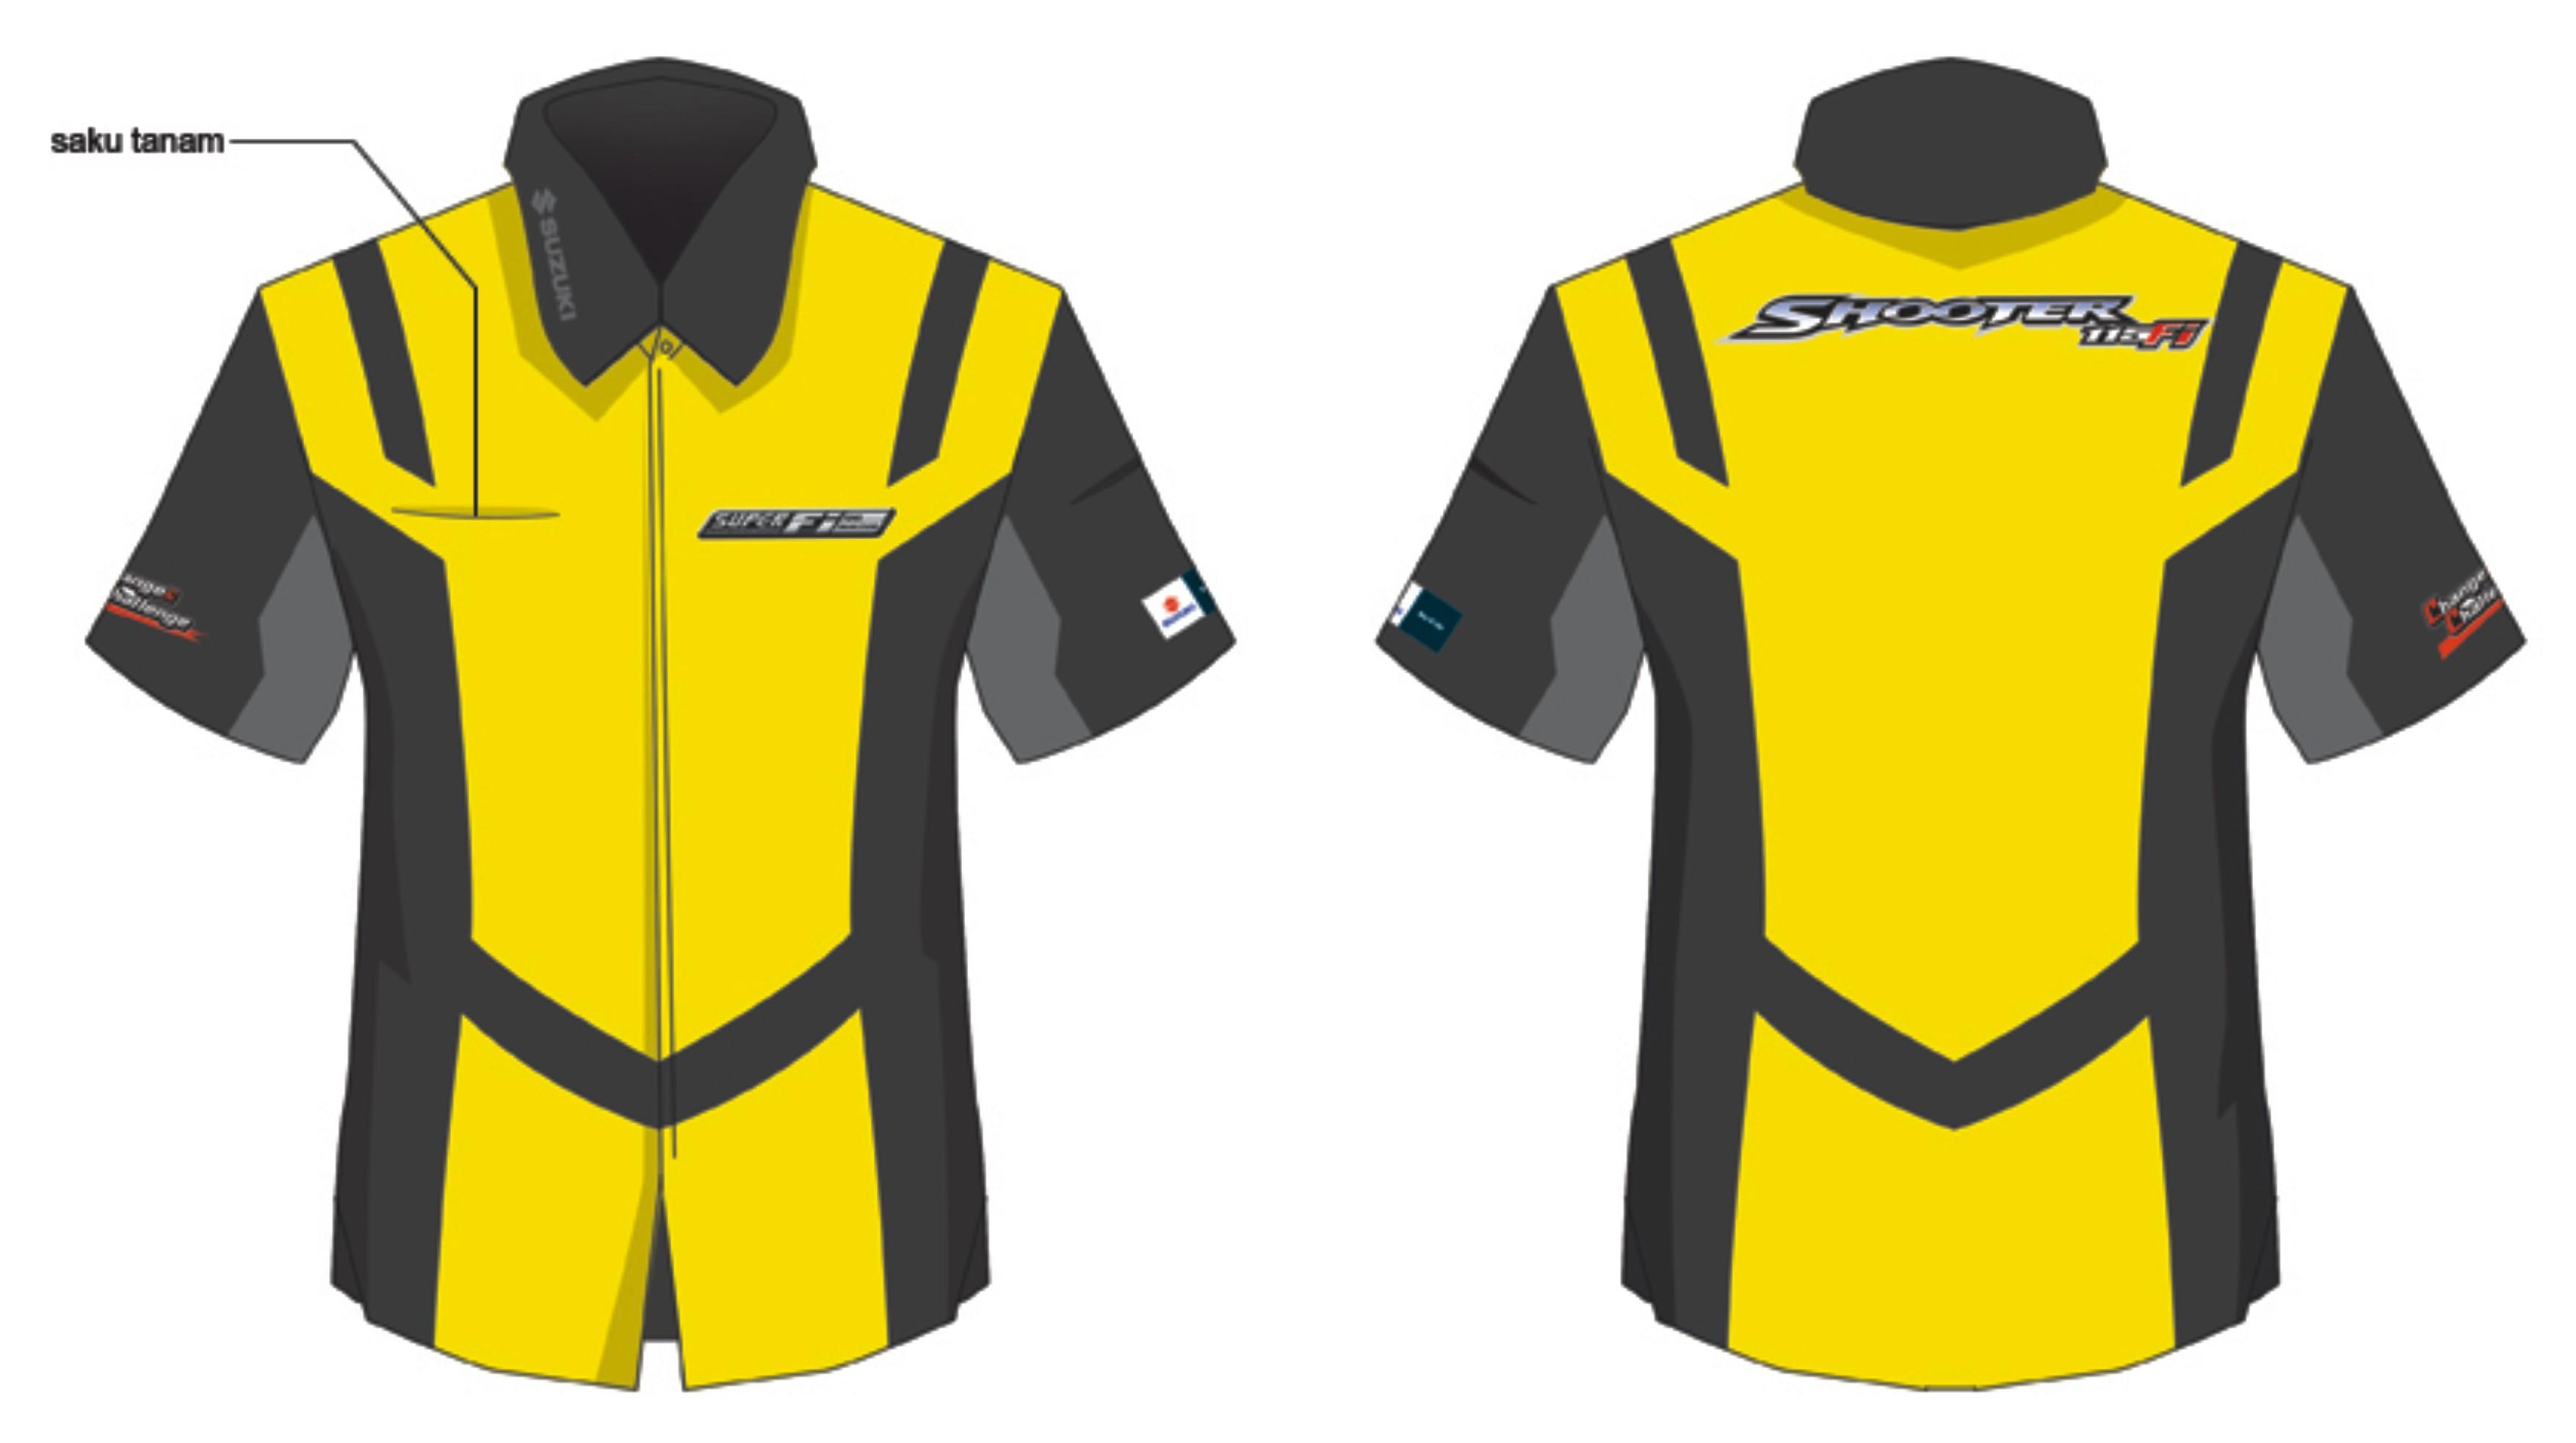 seragam safety di sidoarjo surabaya konveksi seragam safety seragam